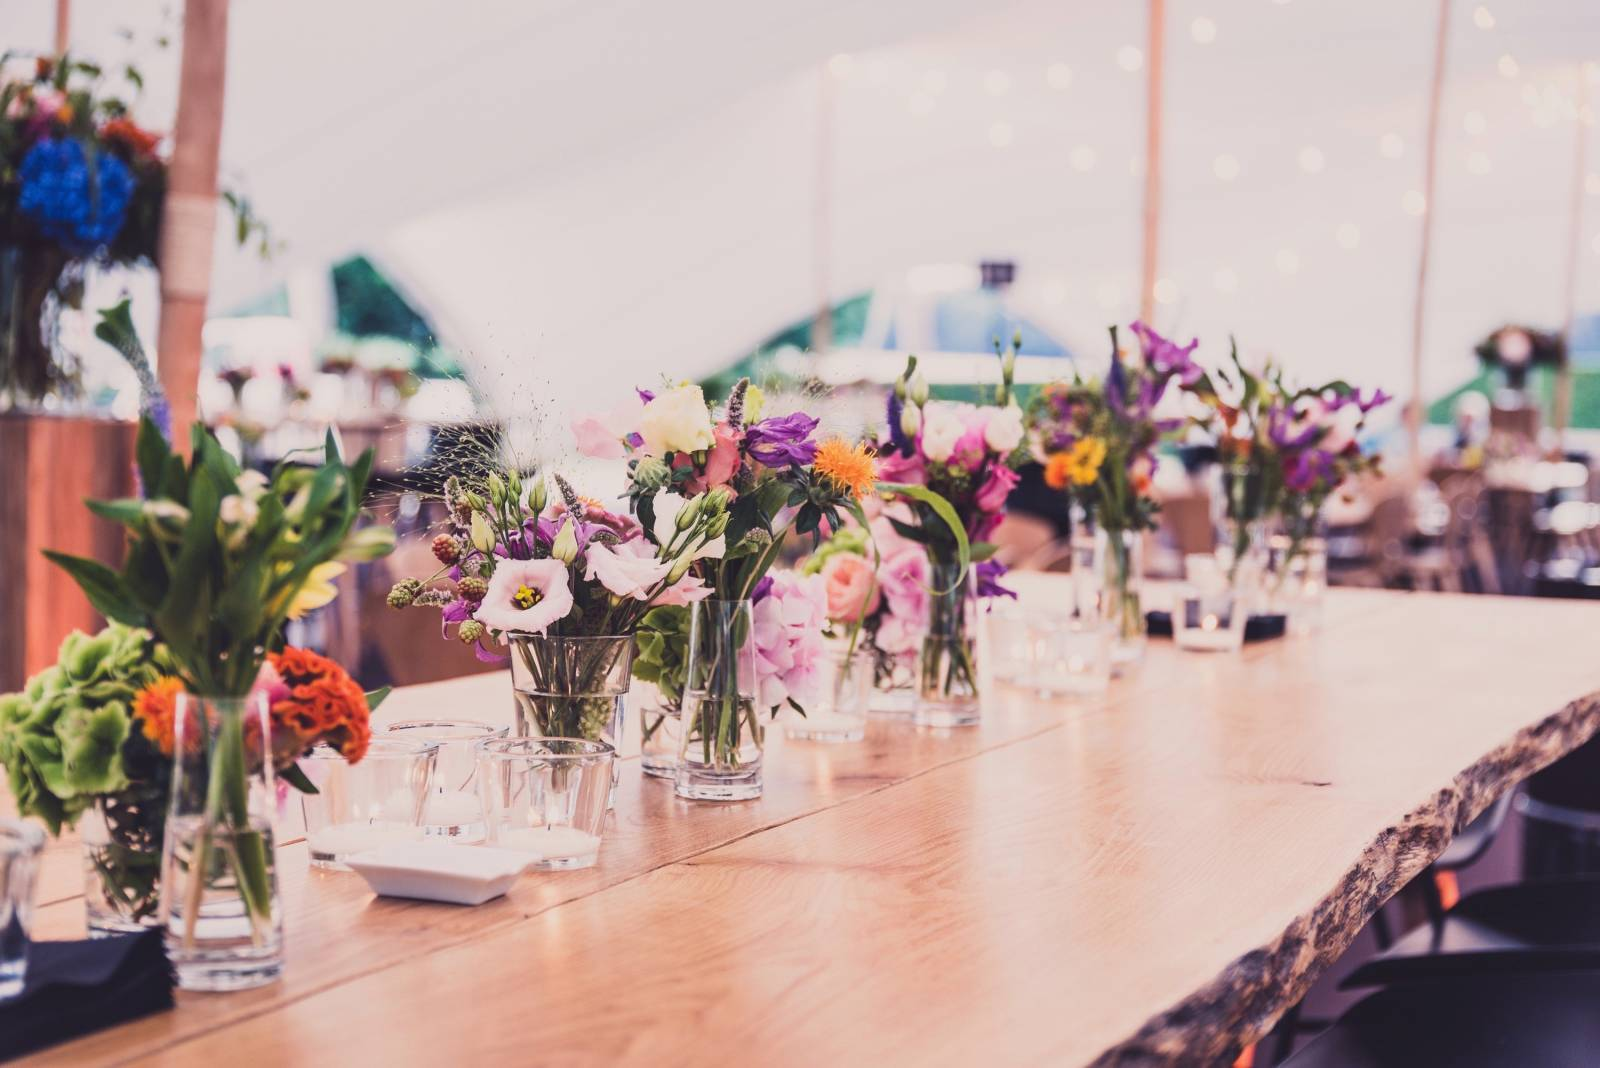 Présence- House of Weddings - 2 (1)